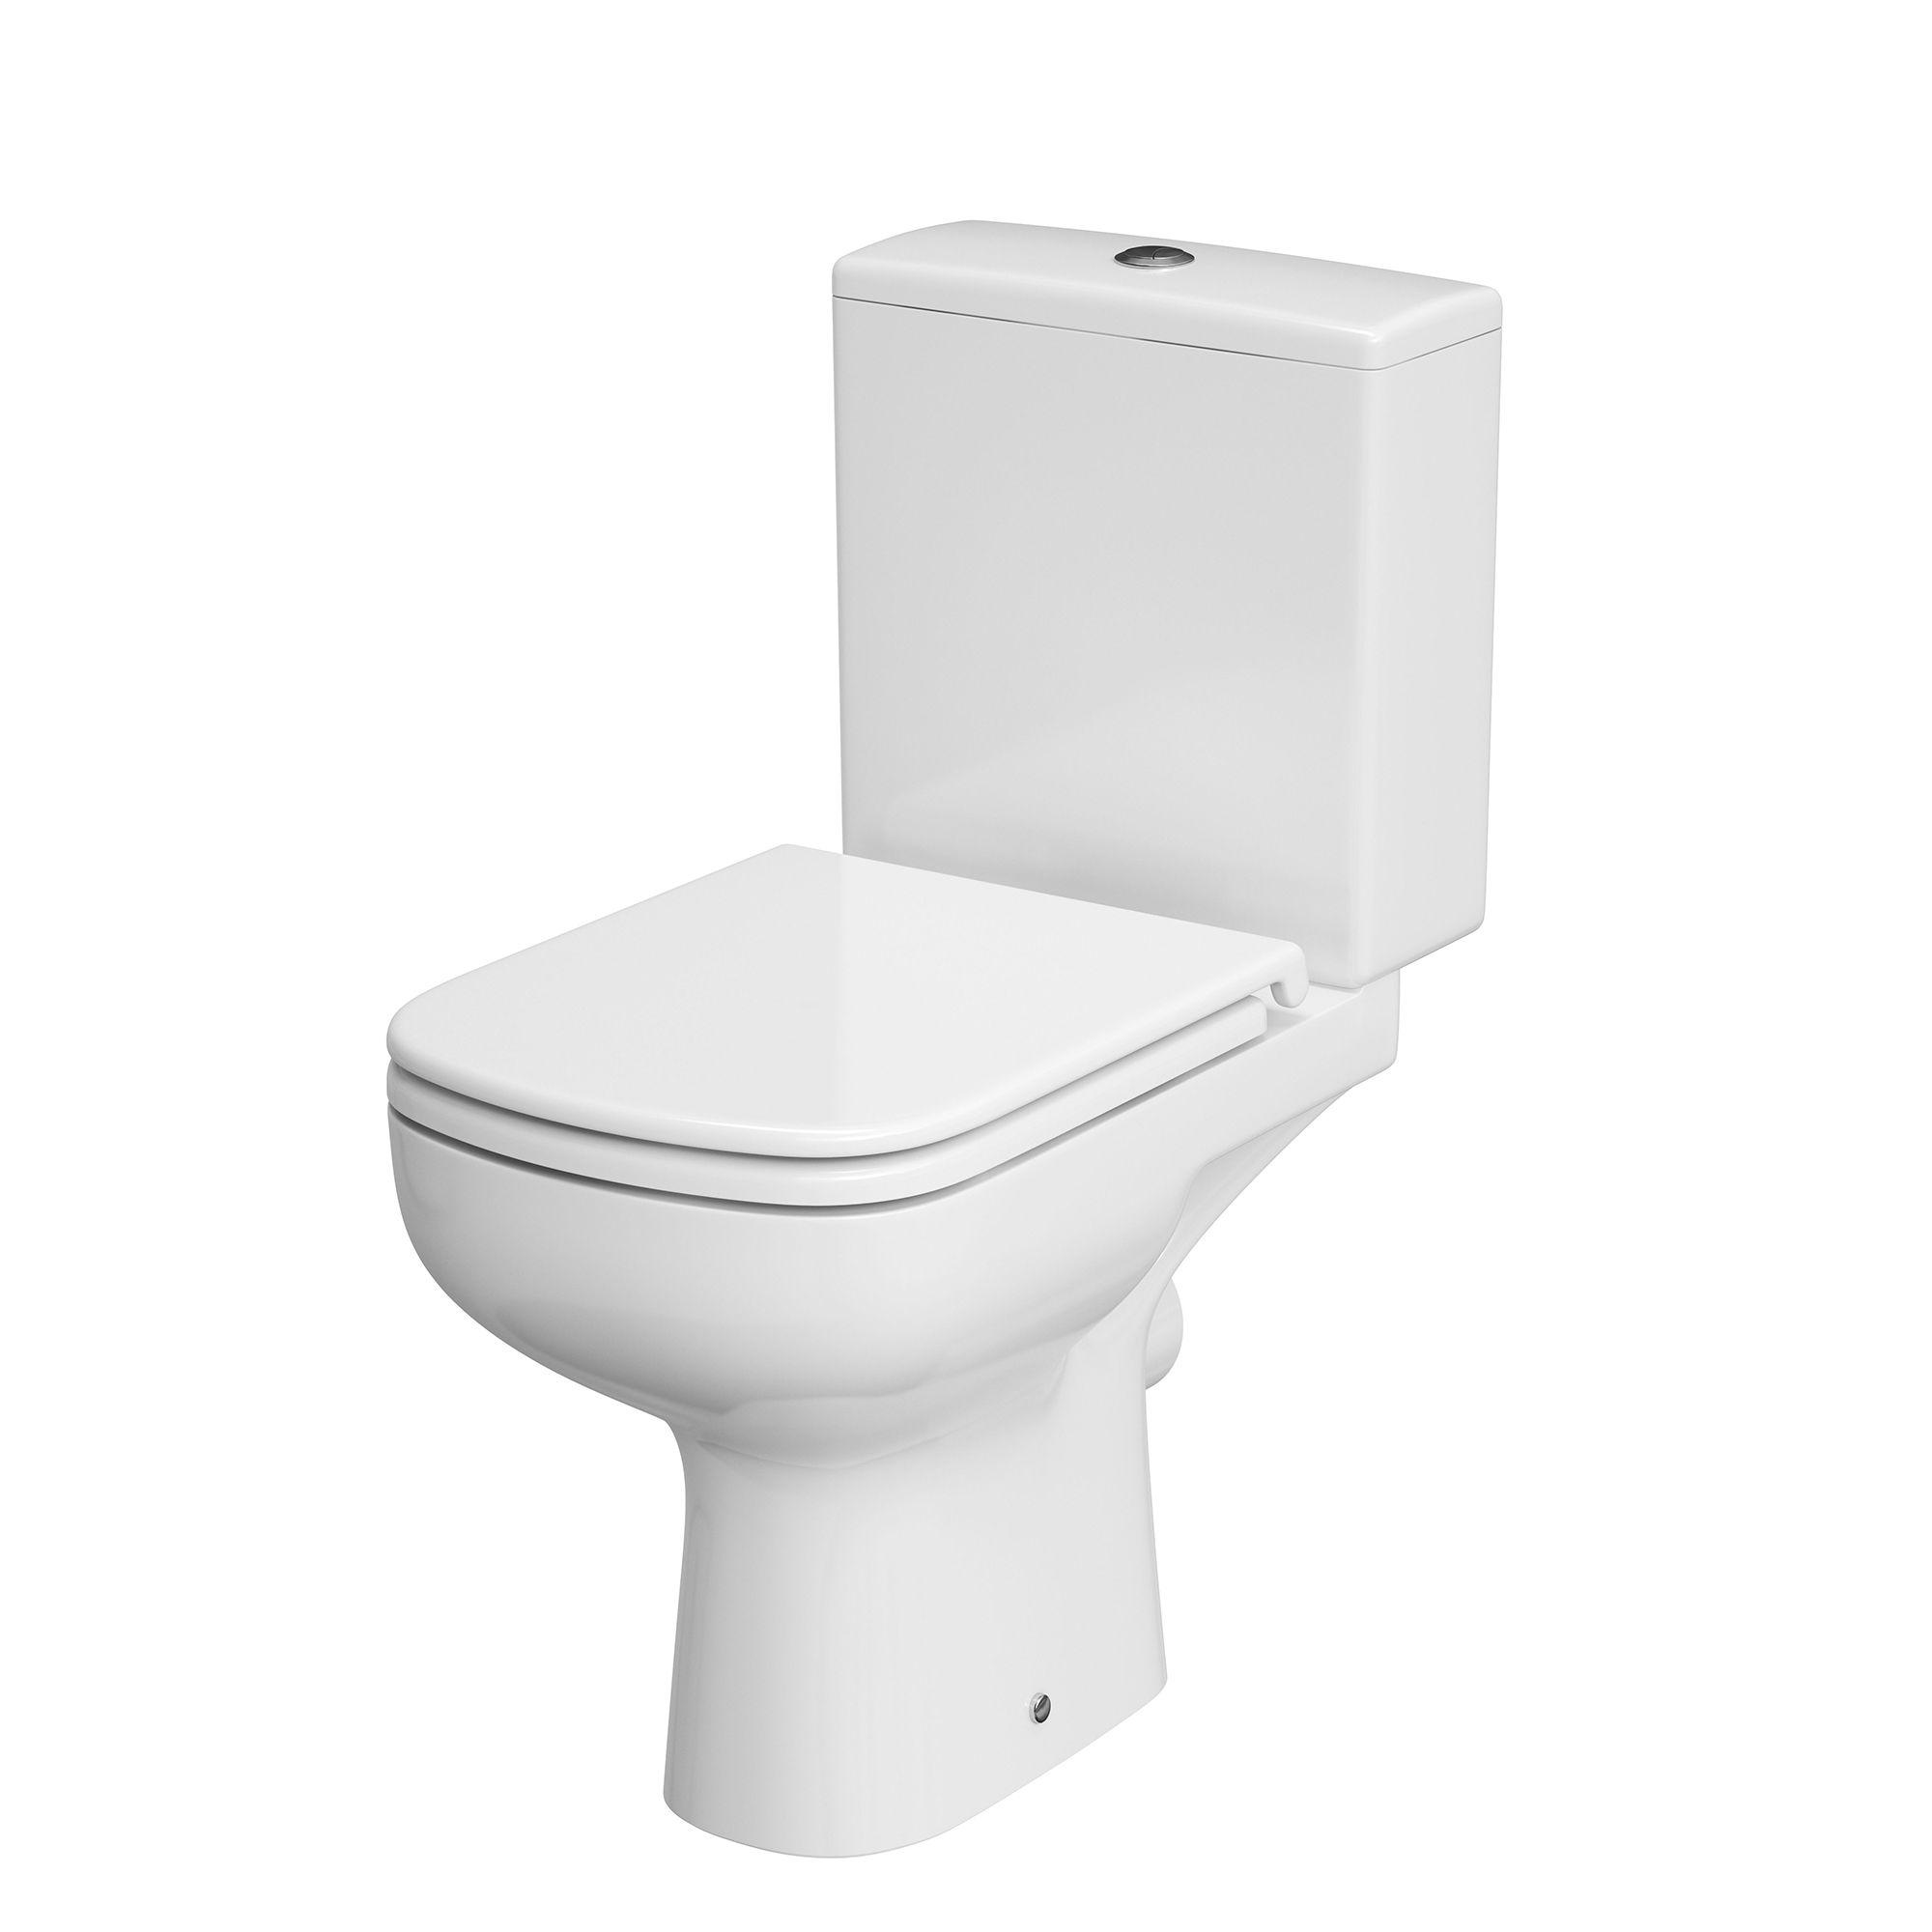 Cersanit Cortona Close Coupled Rimless Toilet With Soft